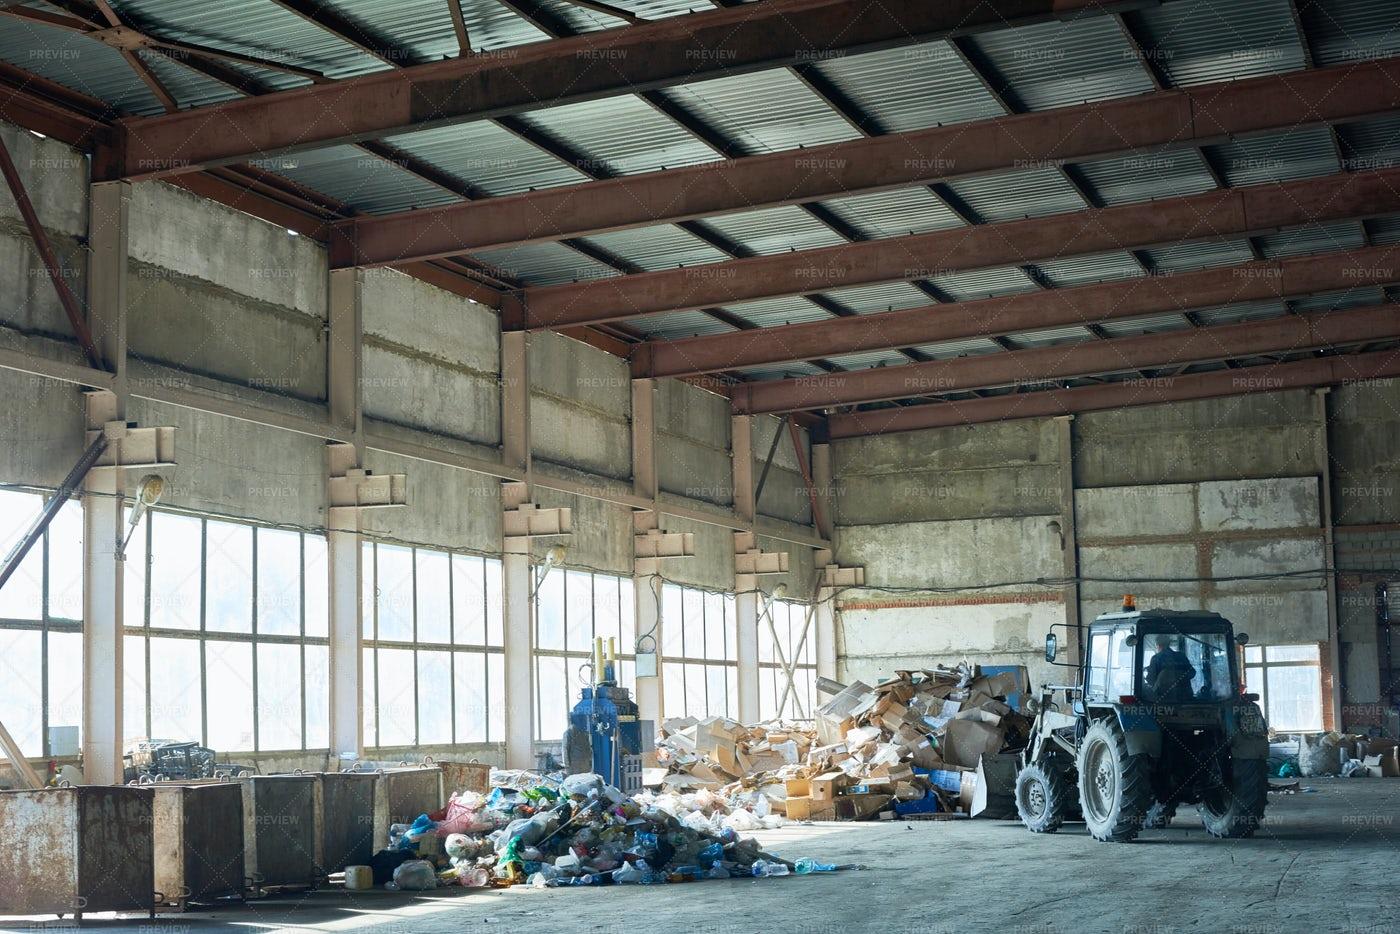 Storage On Waste Processing Plant: Stock Photos